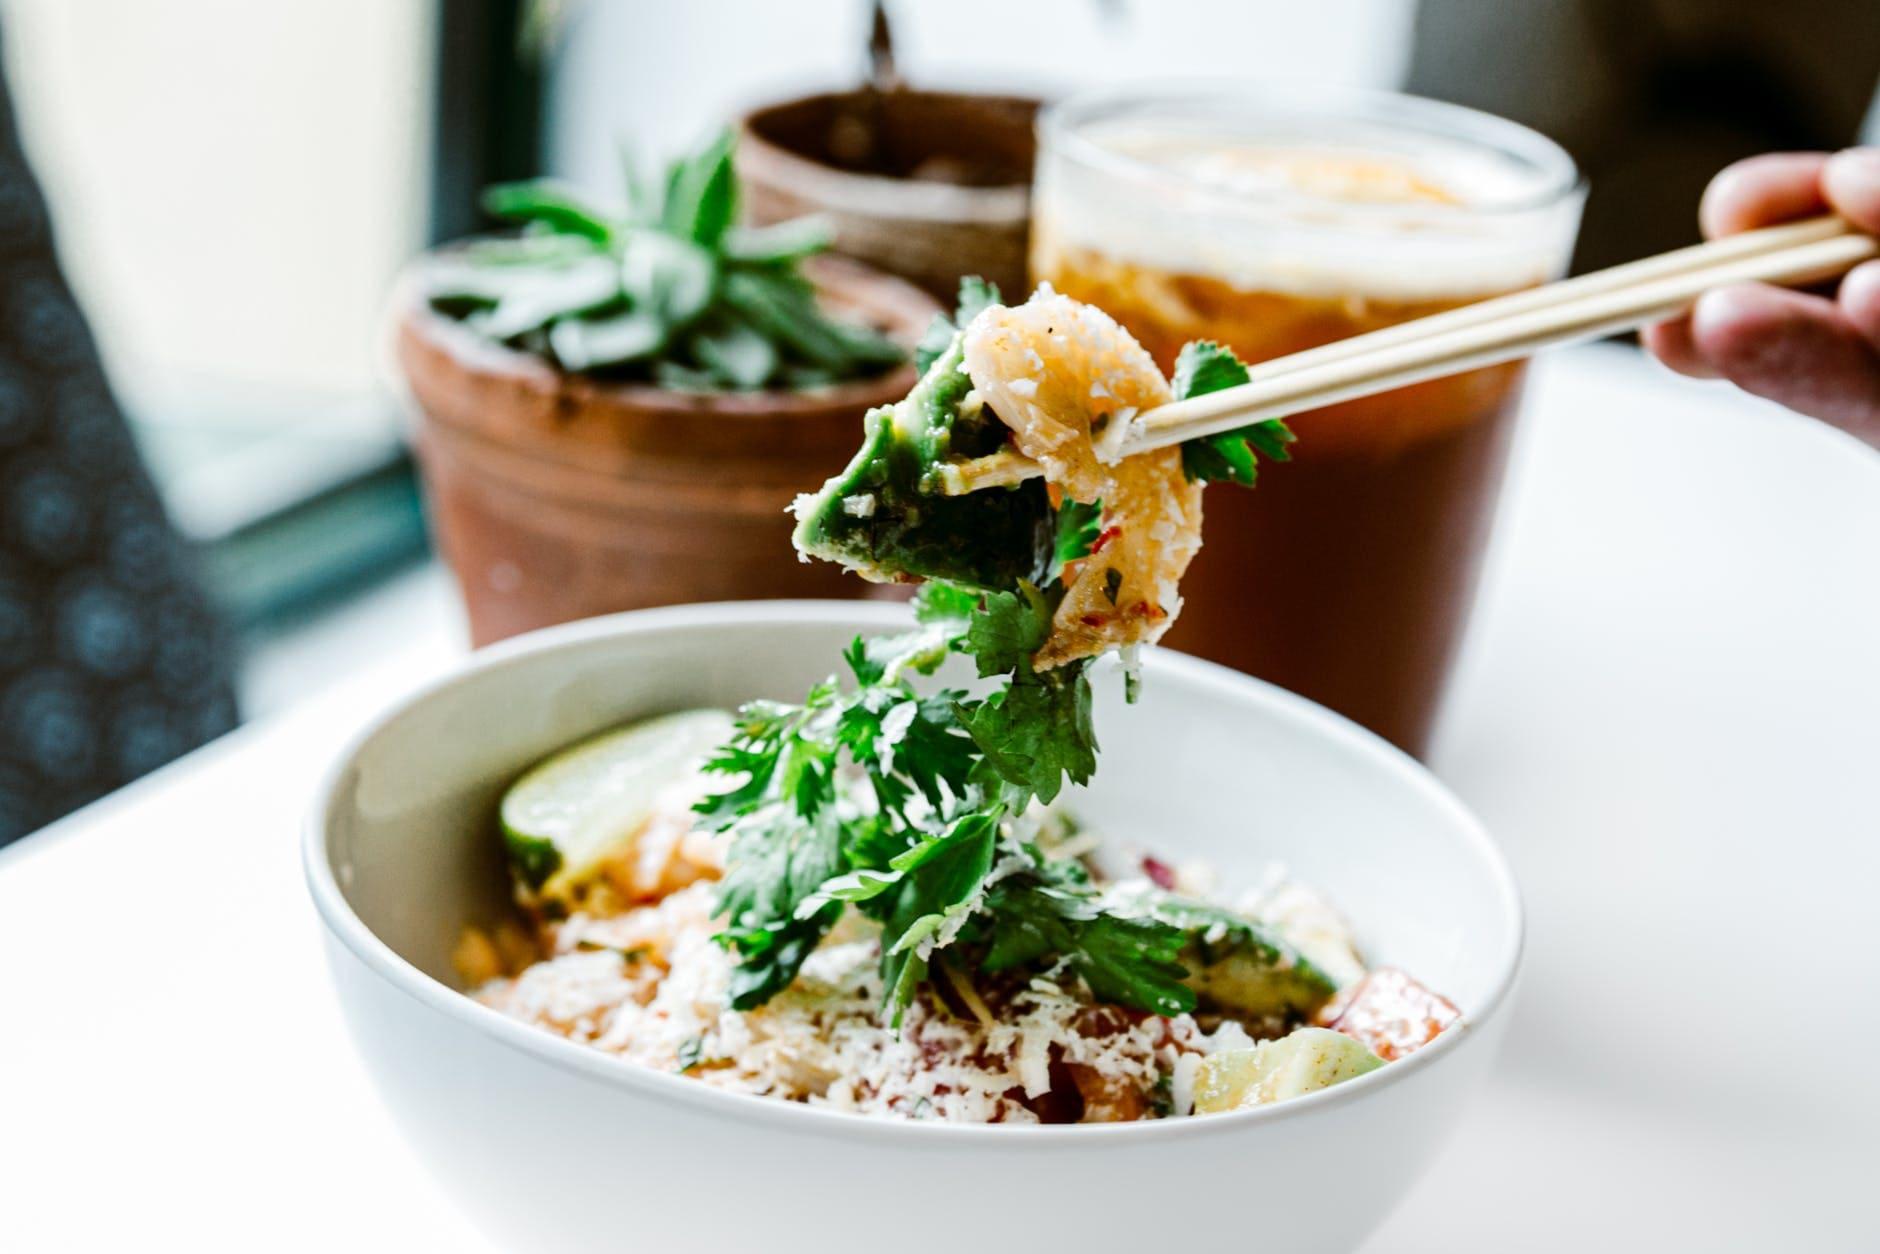 How to make a shrimp cocktail salad